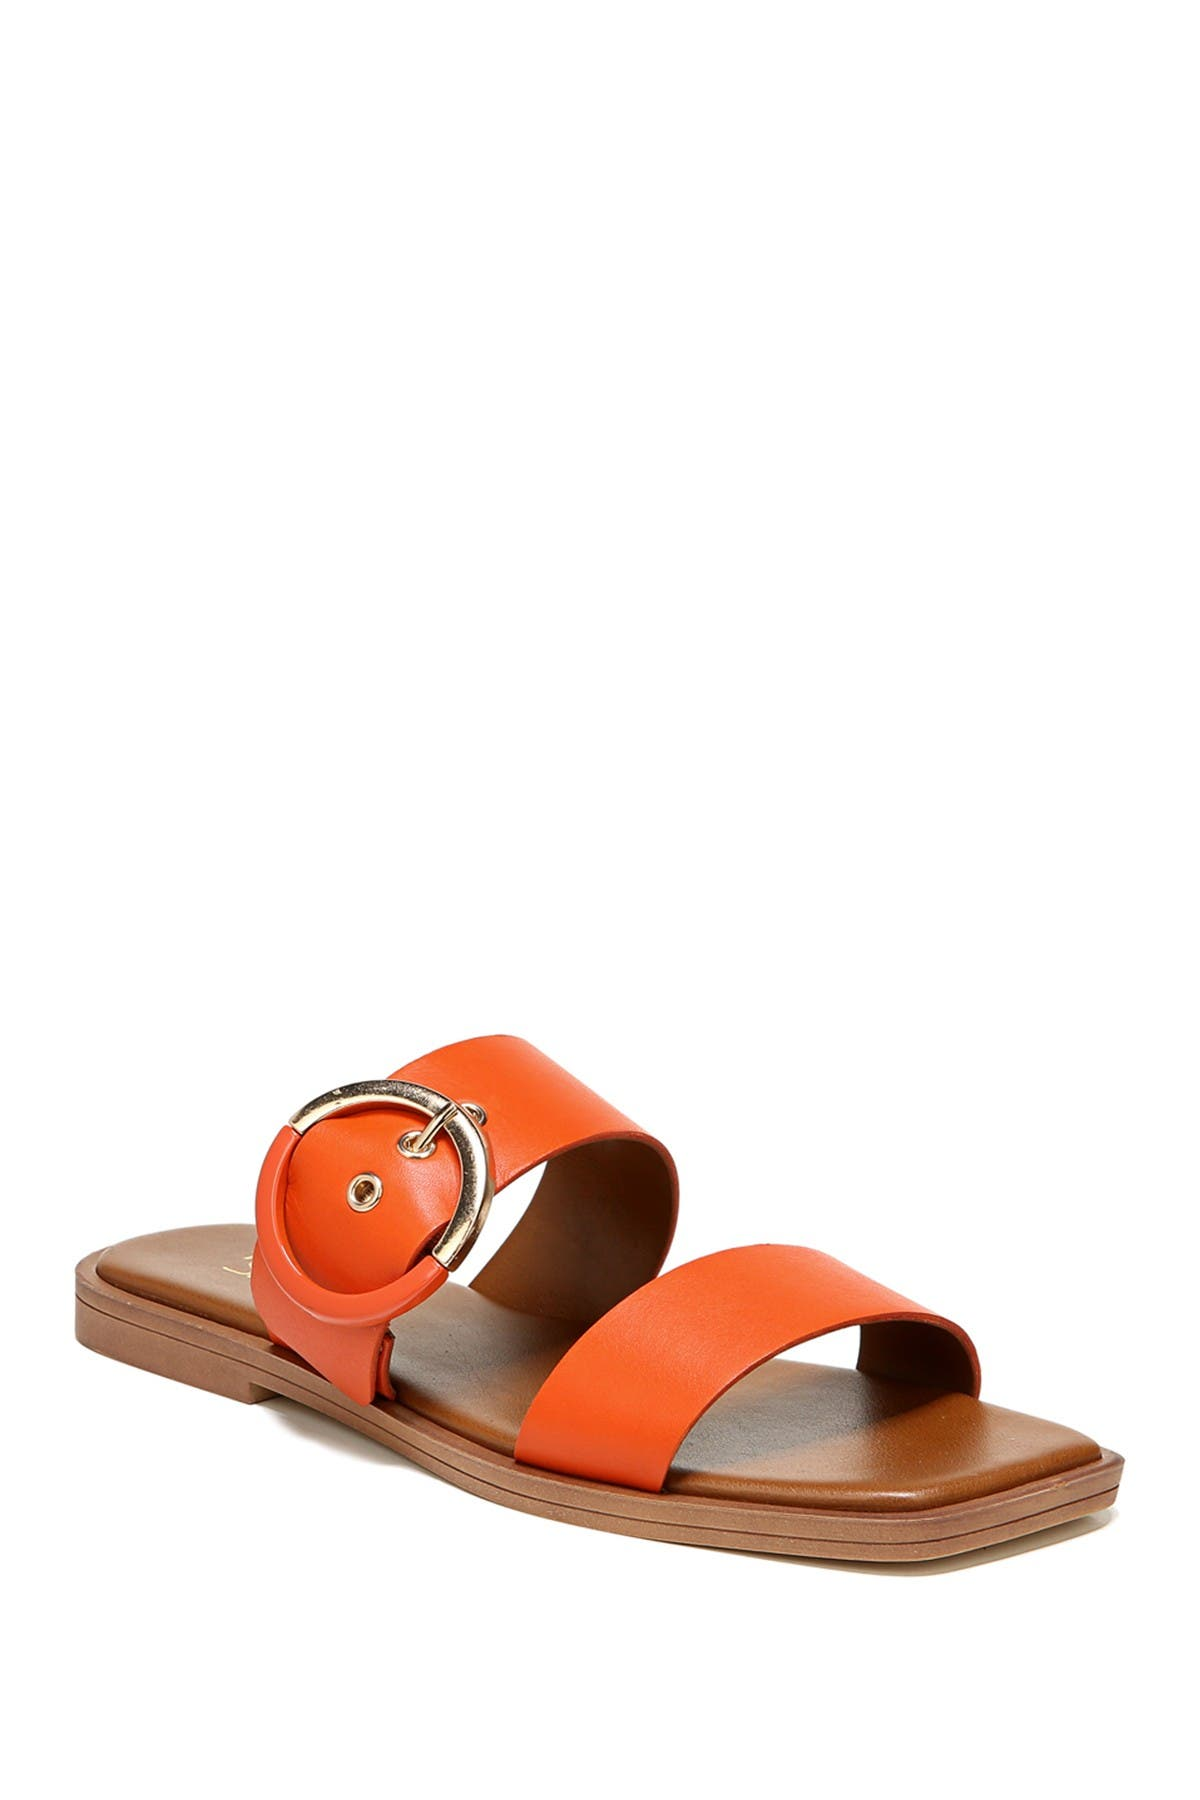 Image of Franco Sarto Merris Leather Sandal